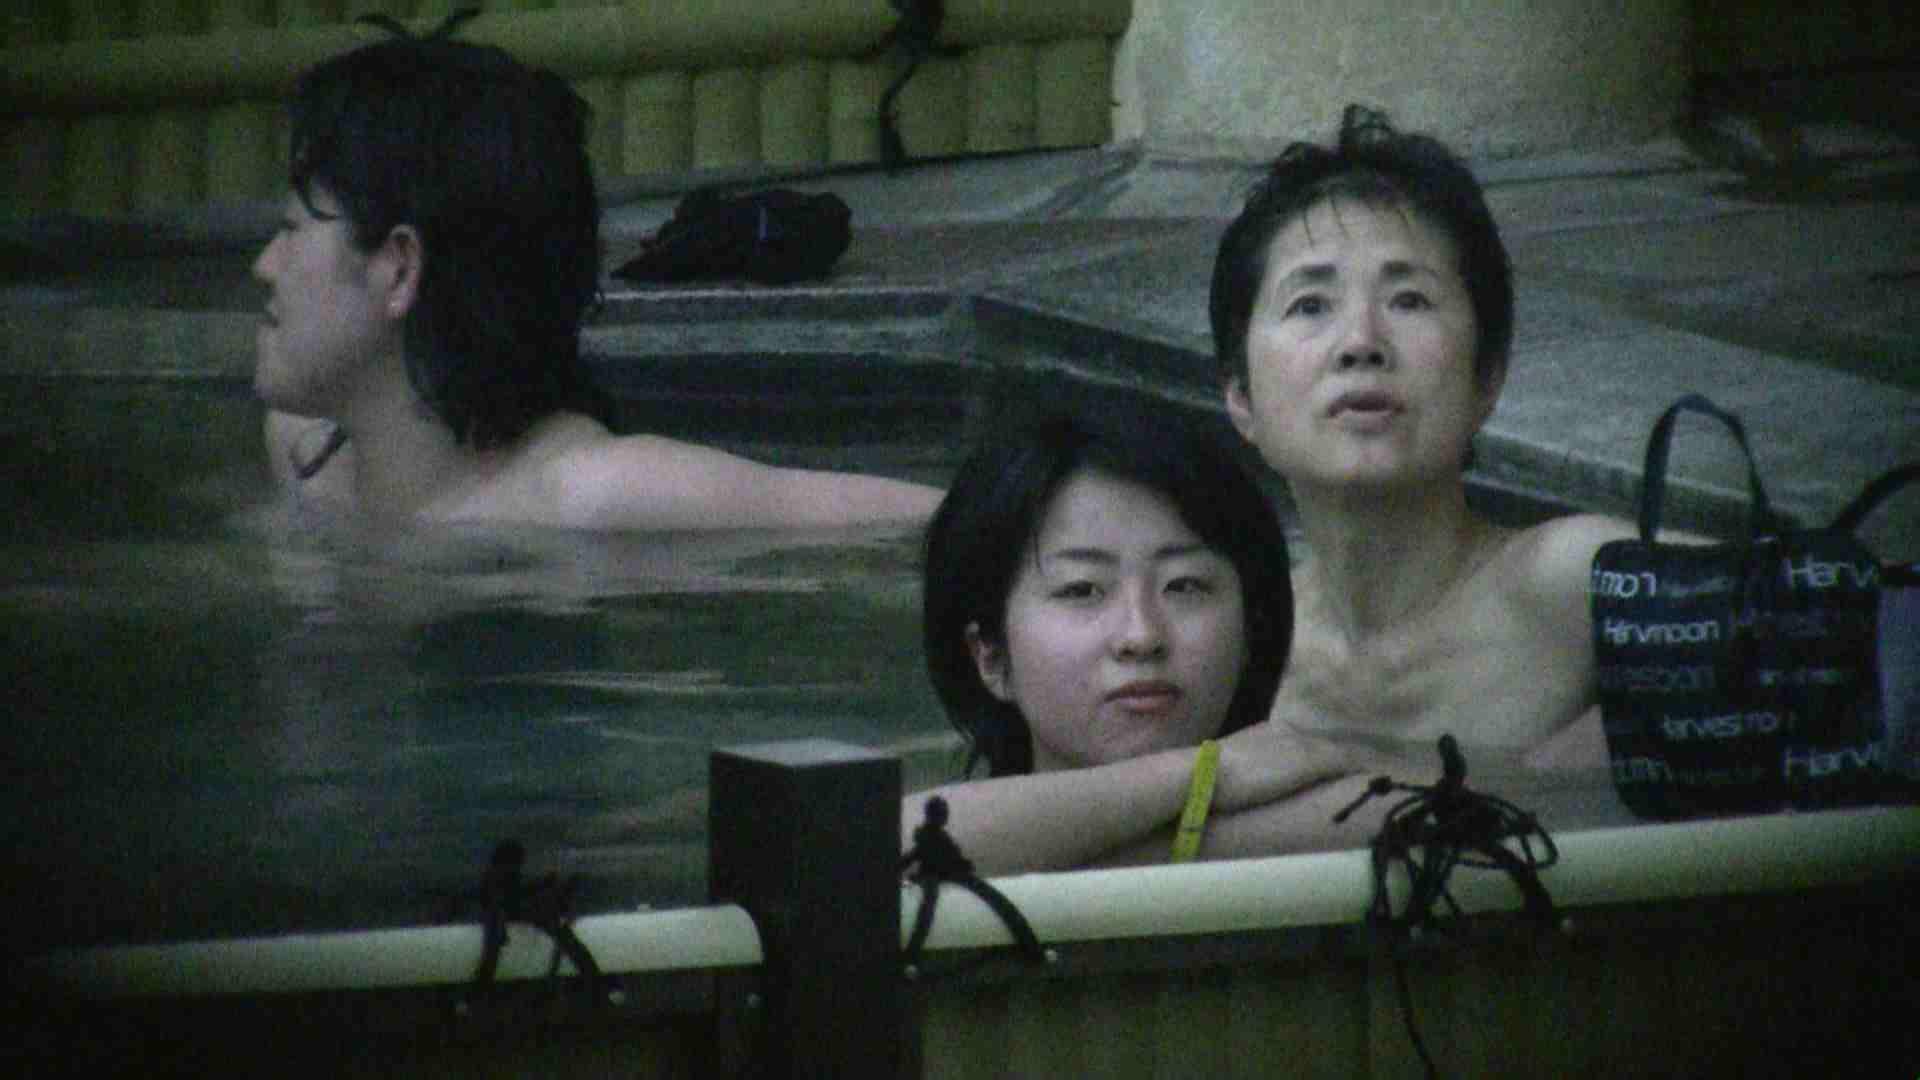 Aquaな露天風呂Vol.112 盗撮シリーズ   露天風呂編  93PIX 29